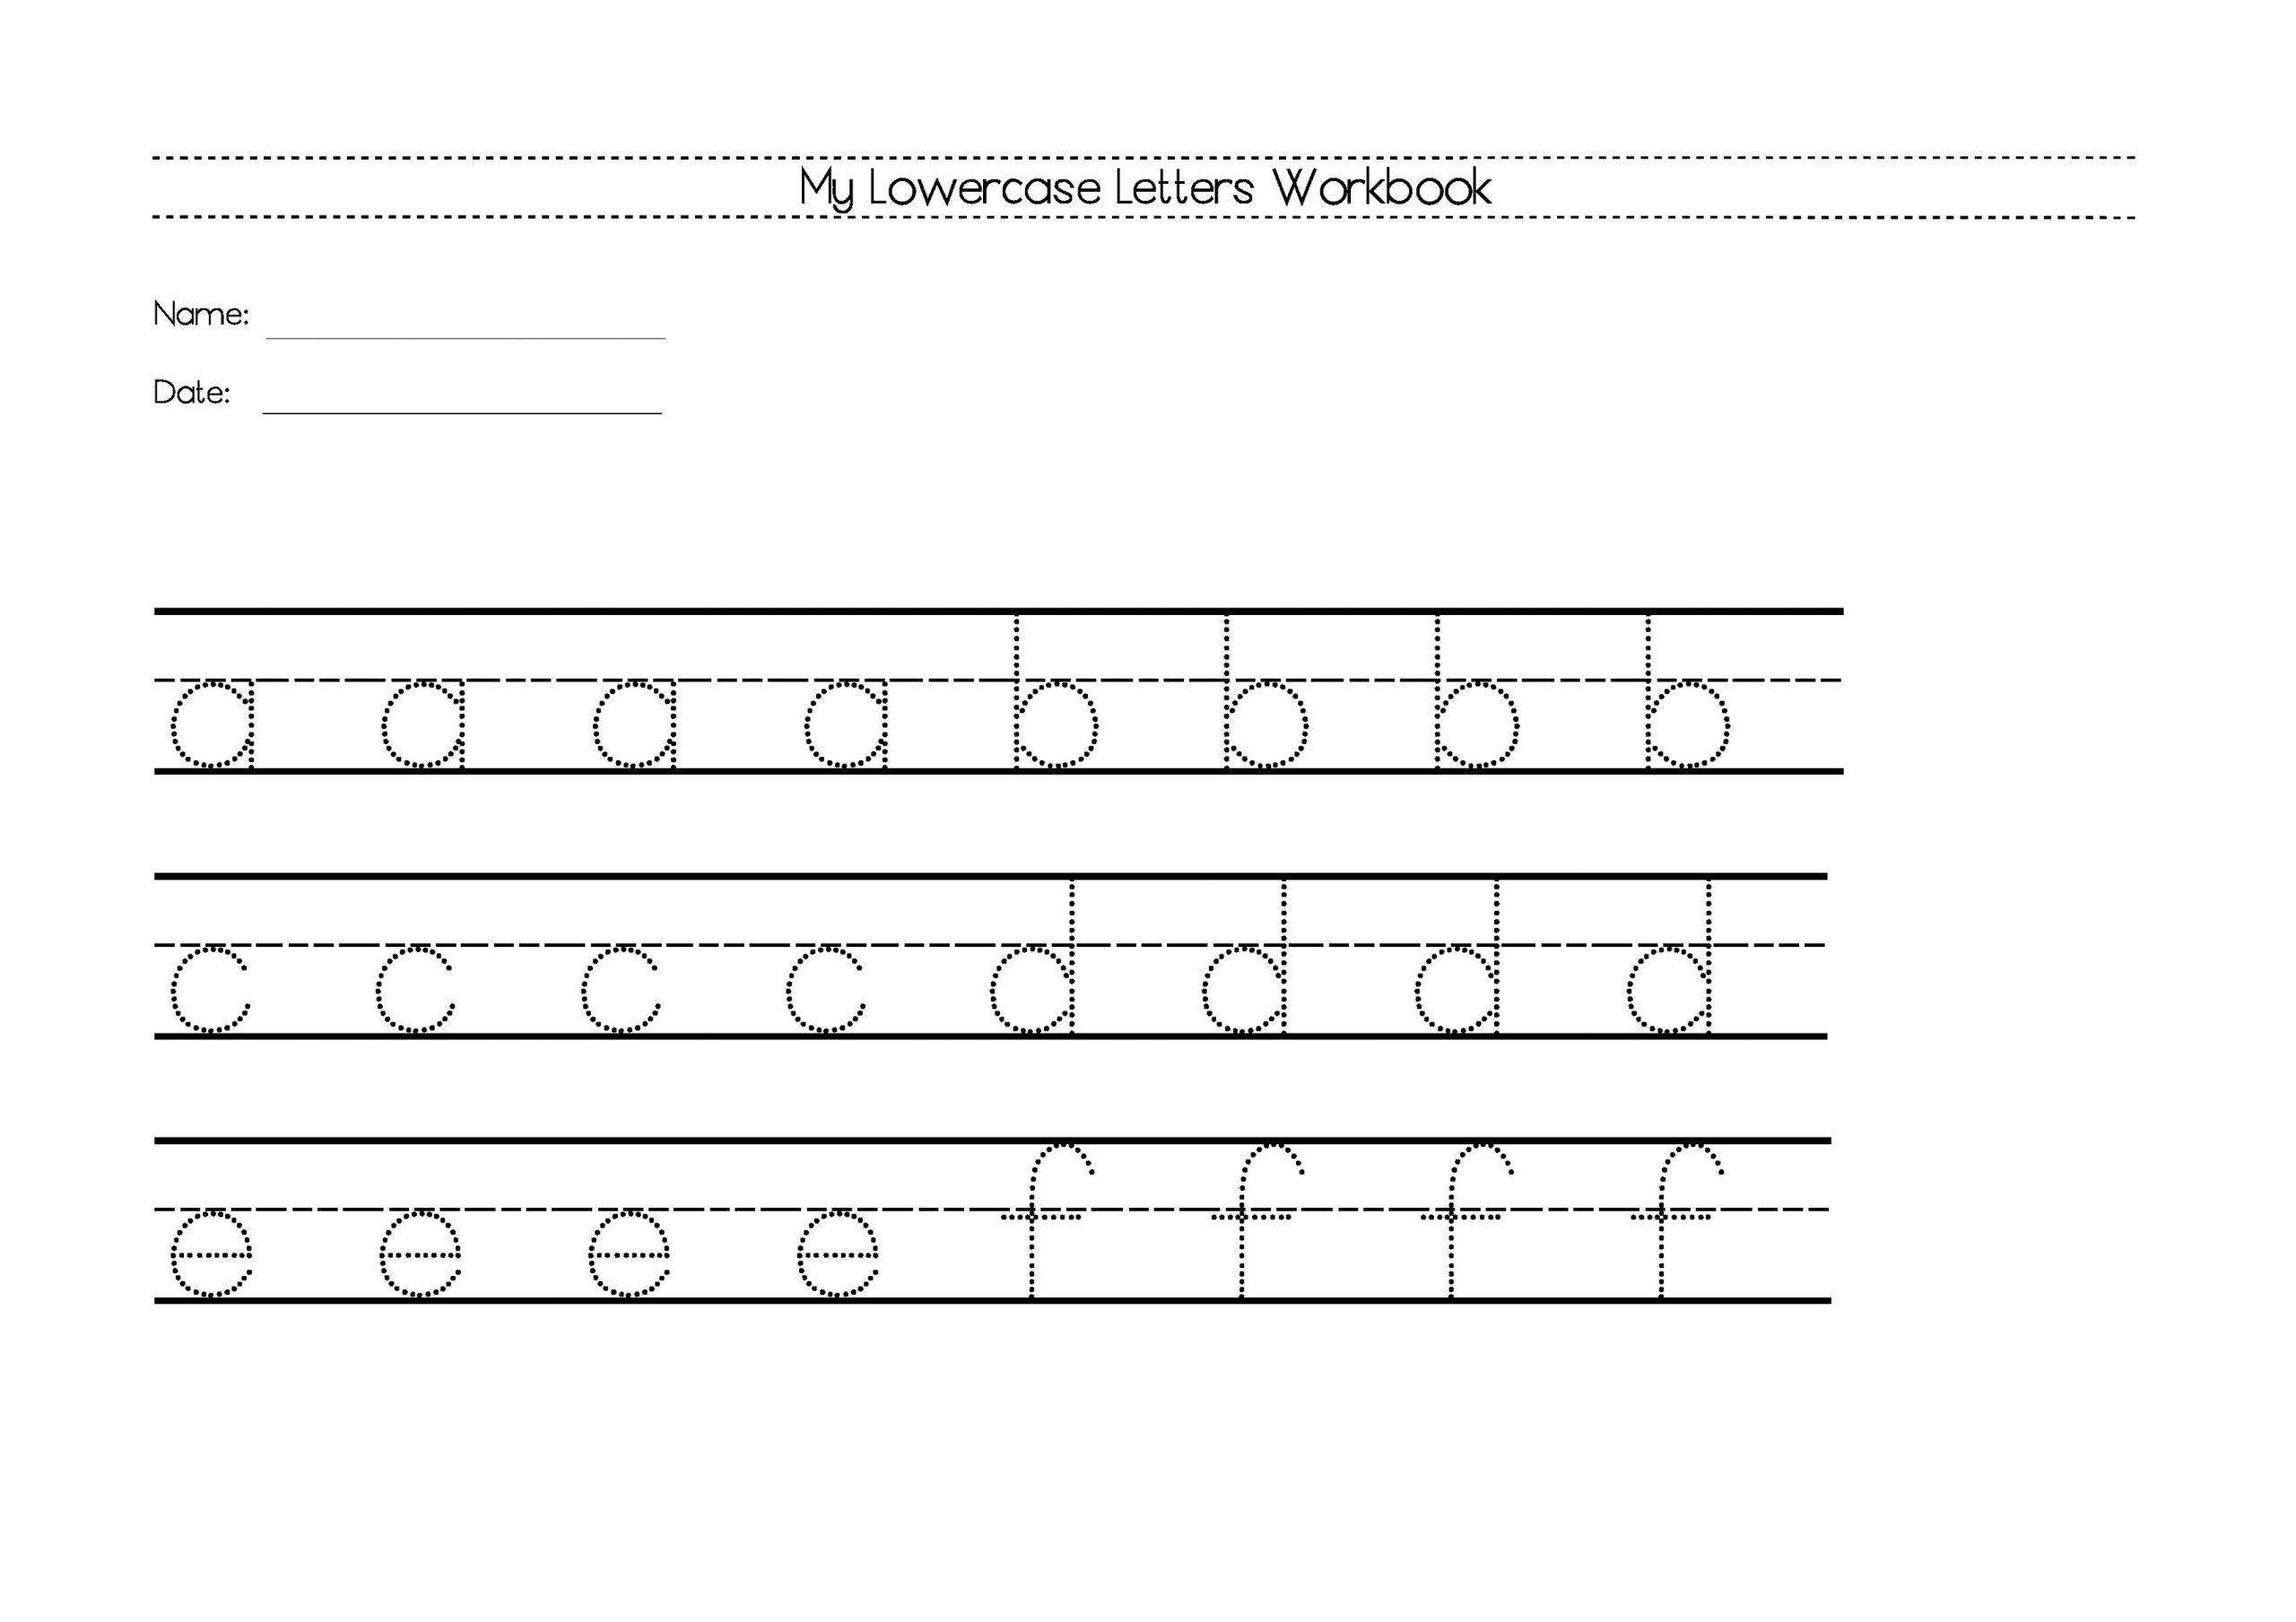 wiriting lower case alphabet worksheets